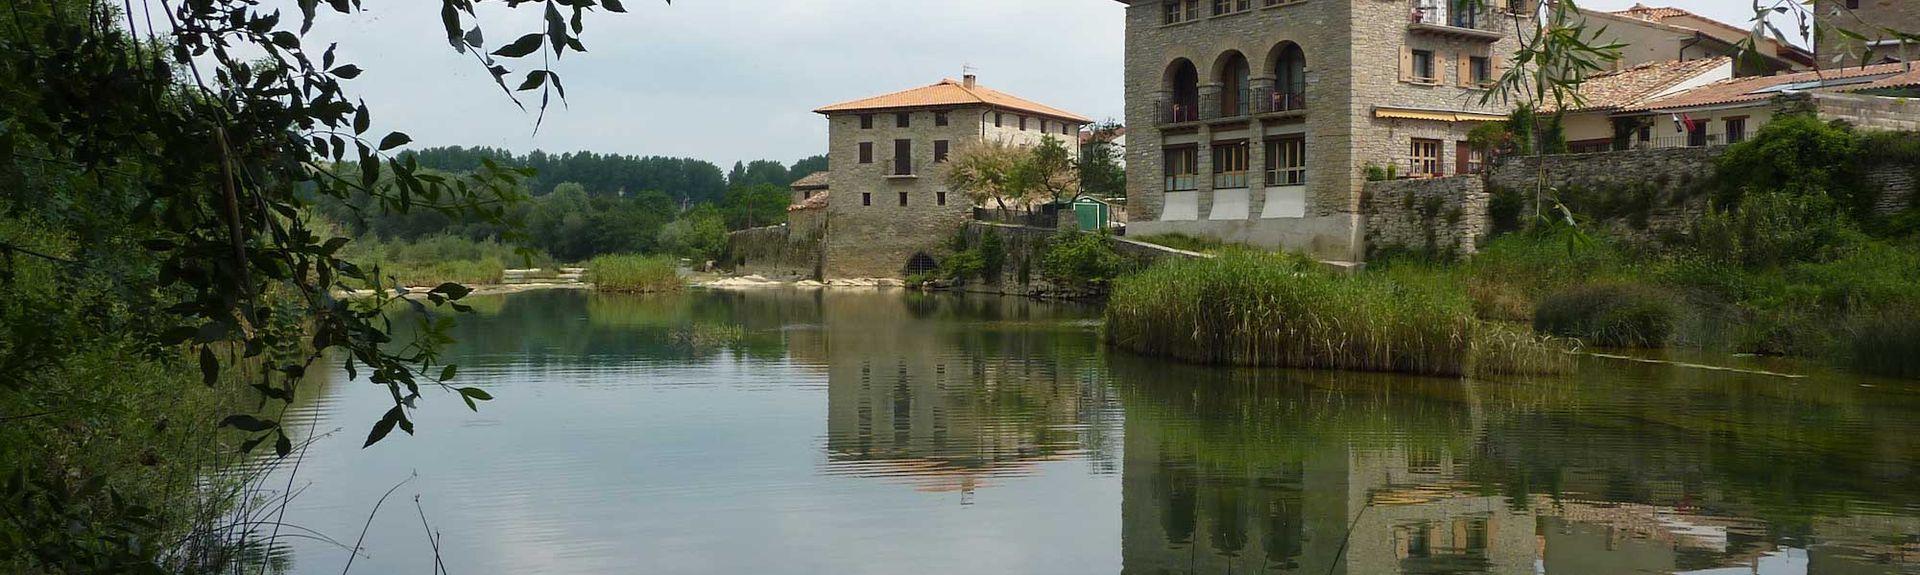 Guesálaz, Navarra, Spanje